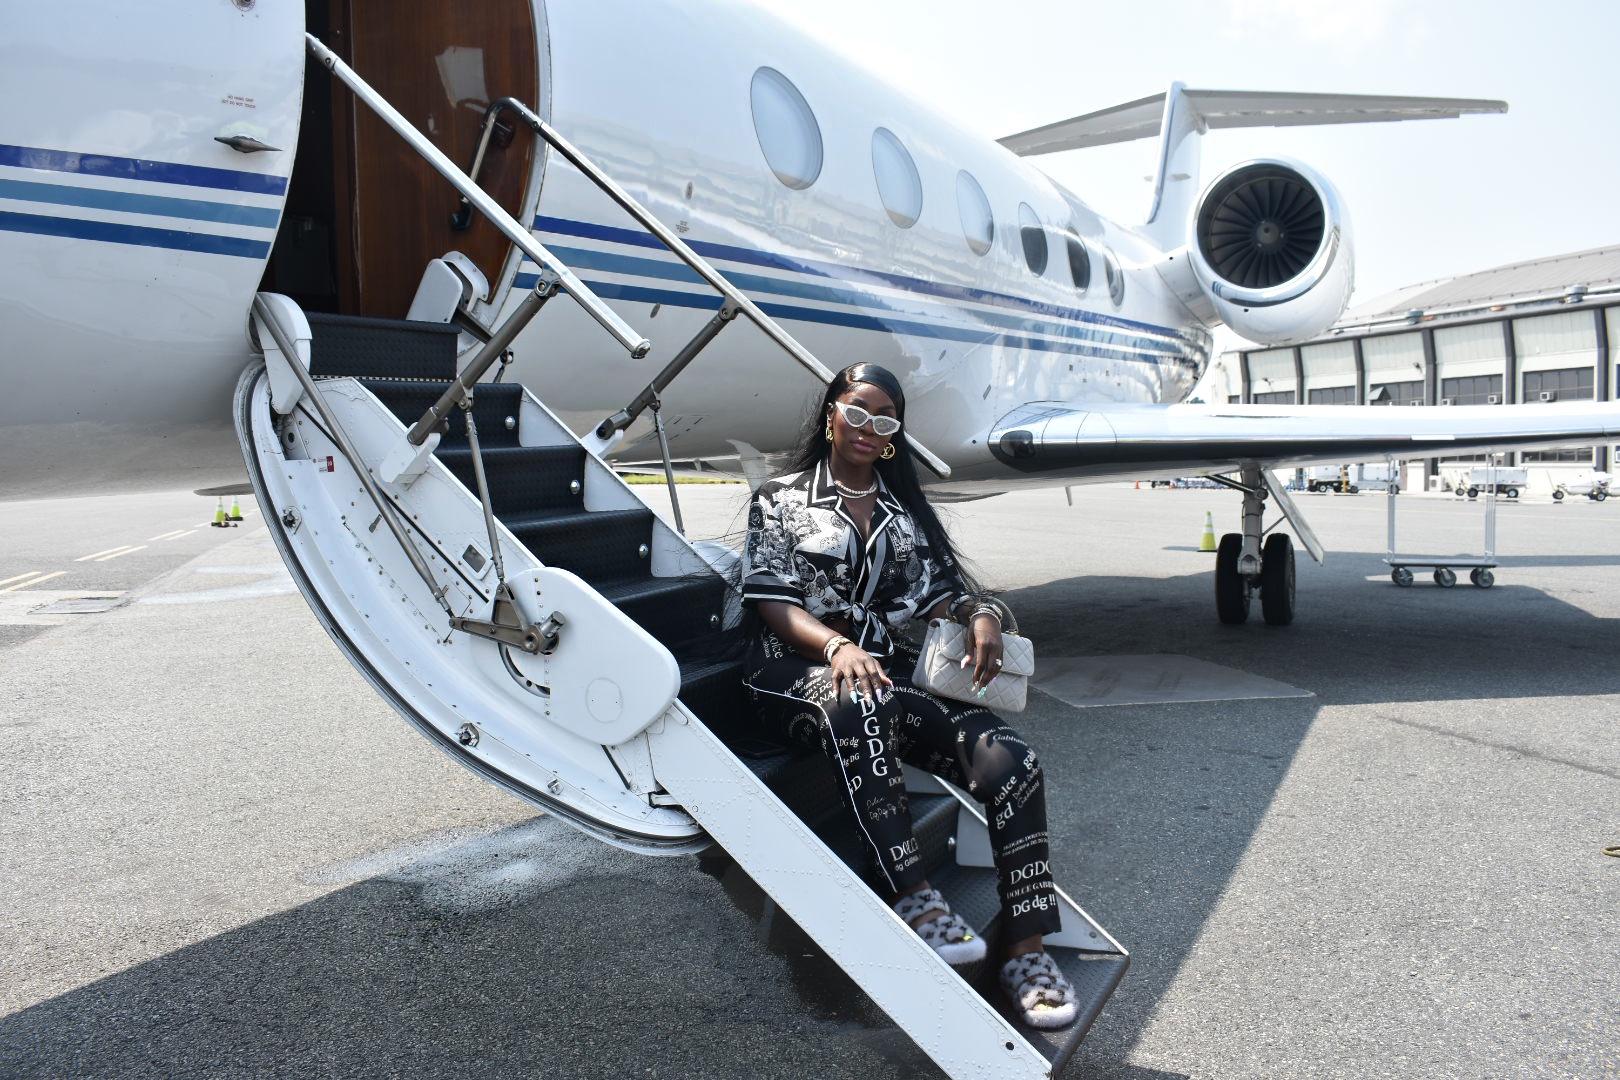 FaFa-Lux-RichSoil-Campnova-Cannabis-Lifestyle-Luxury-Interview-Celebrity-Plane